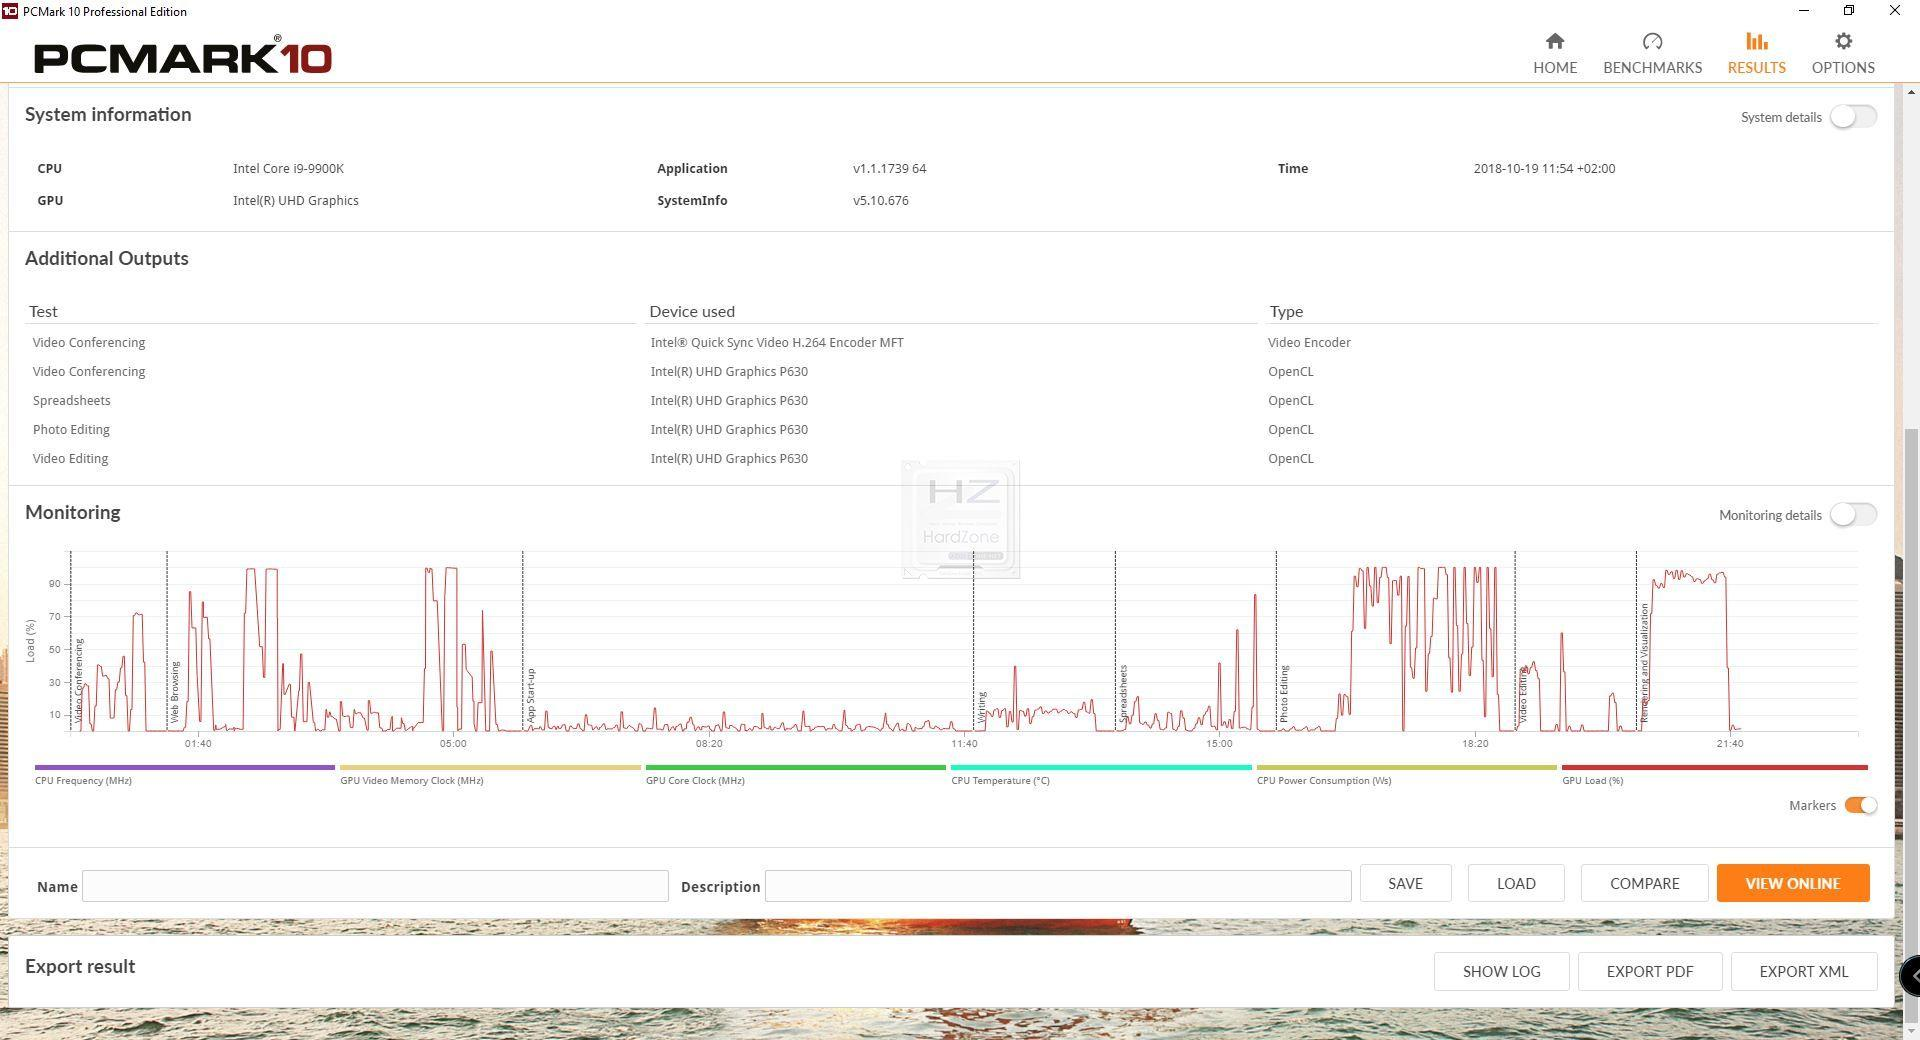 Intel i9 9900K PCMark - Review 3